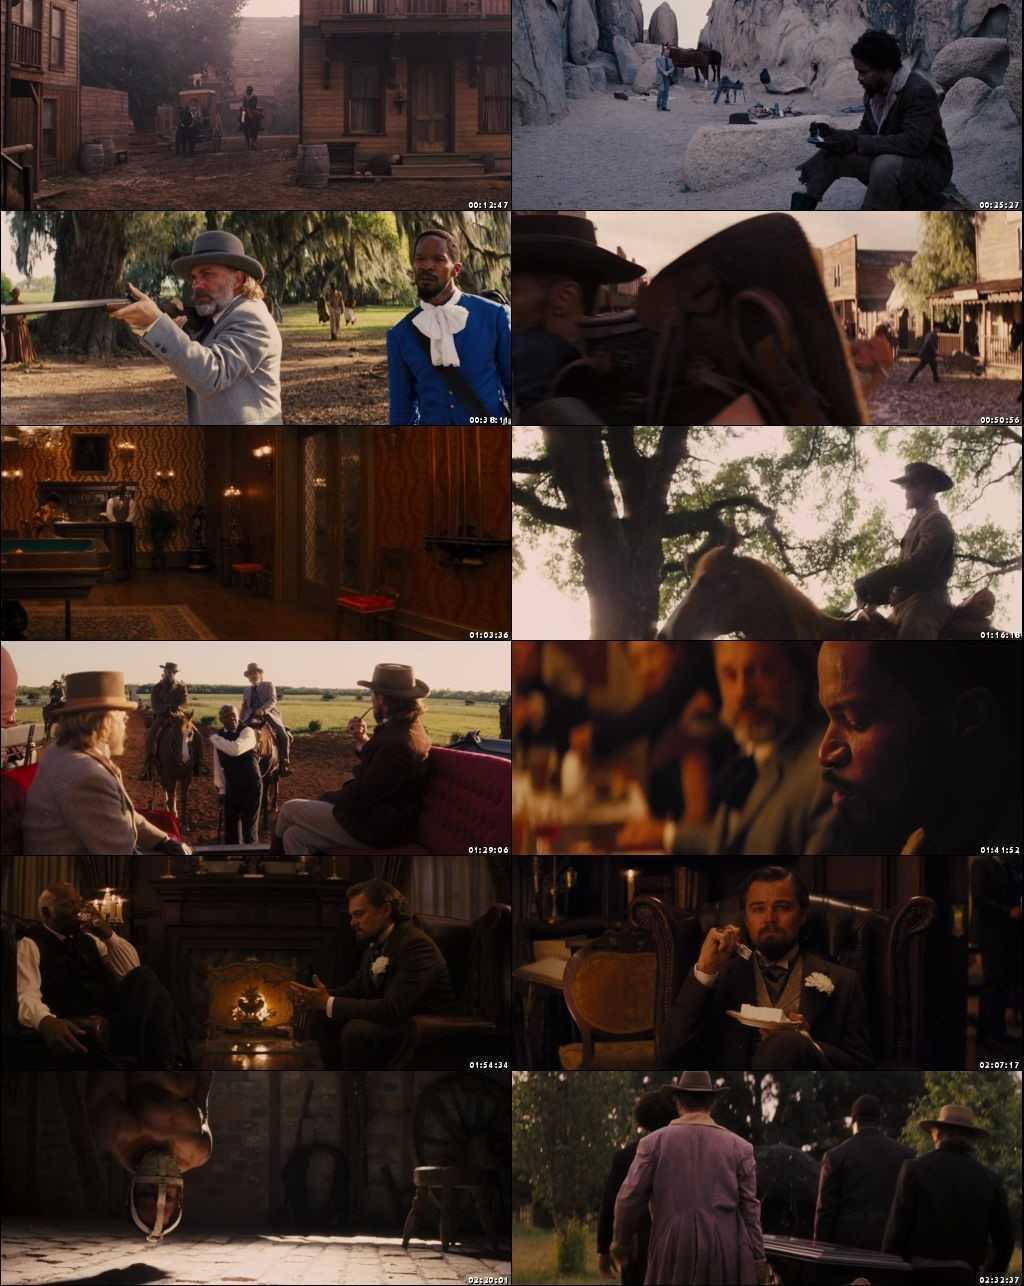 Django Unchained 2012 Screenshot 1080p